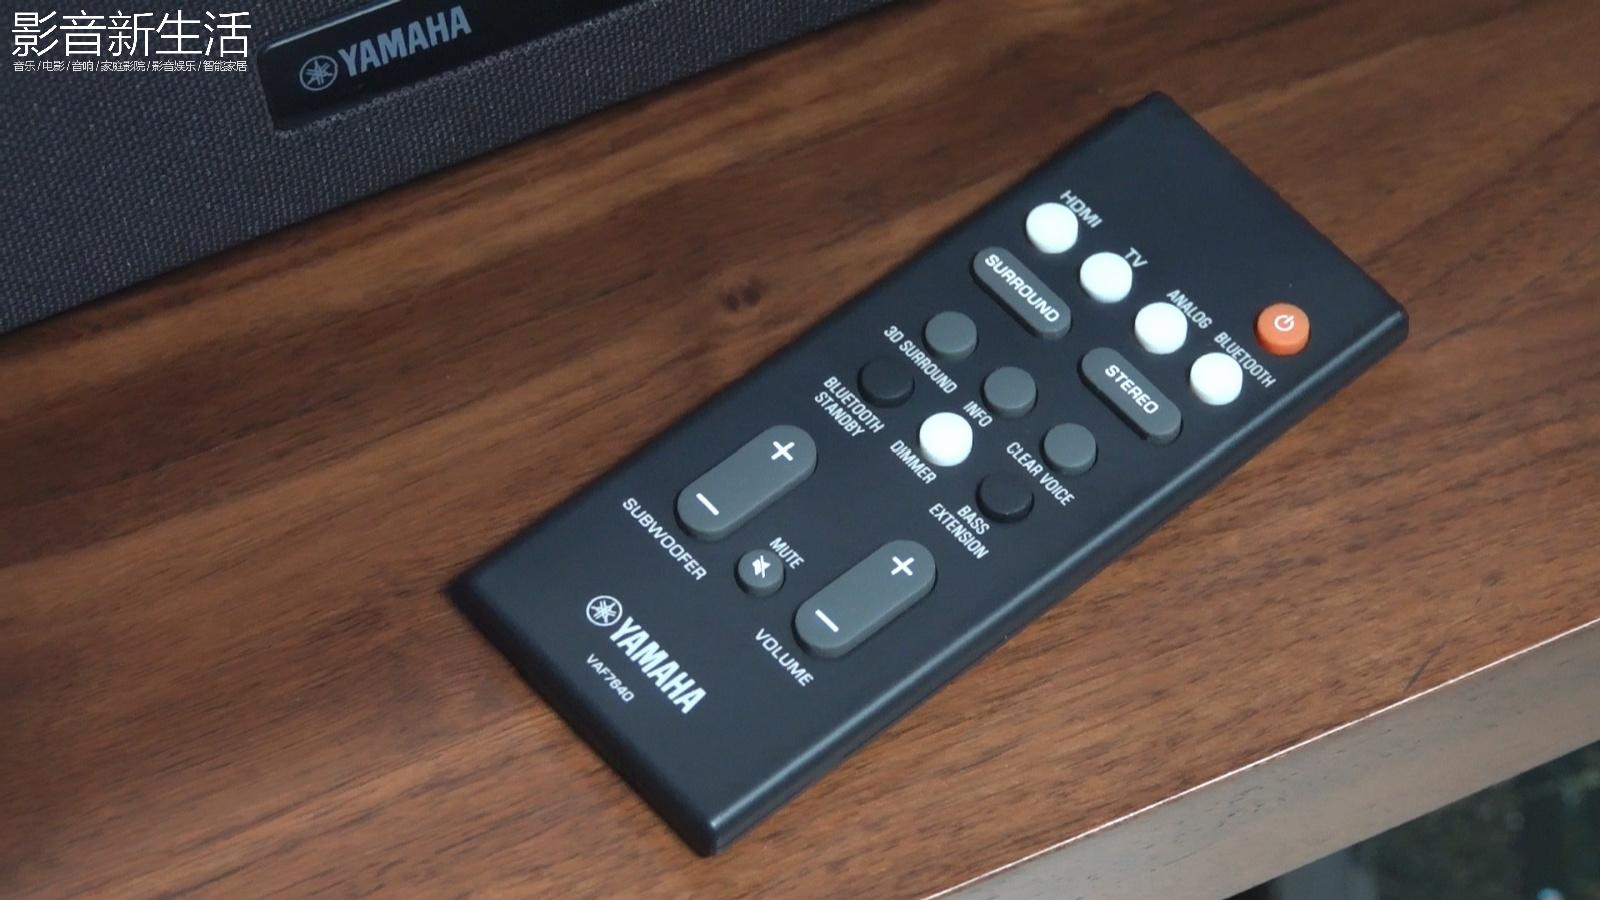 "MAH01722MP4 20180903 175227796 - 推荐 | ""采用DTS Virtual:X技术的客厅娱乐多面手"" Yamaha雅马哈ATS-1080 Soundbar回音壁"